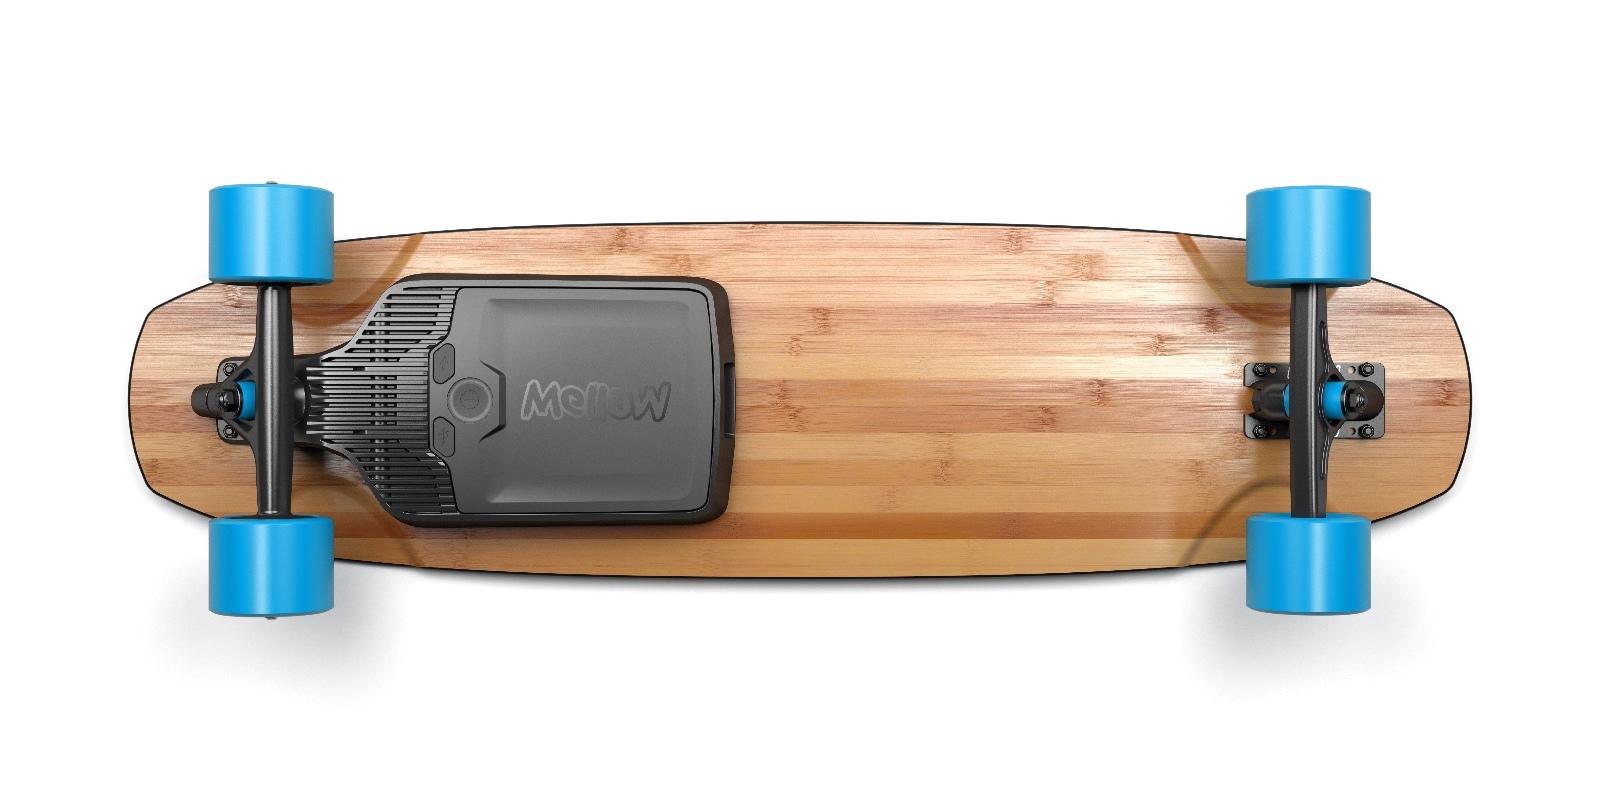 Germanengineered Mellow Boards wants to make DIY electric skateboards cheaper  Electrek